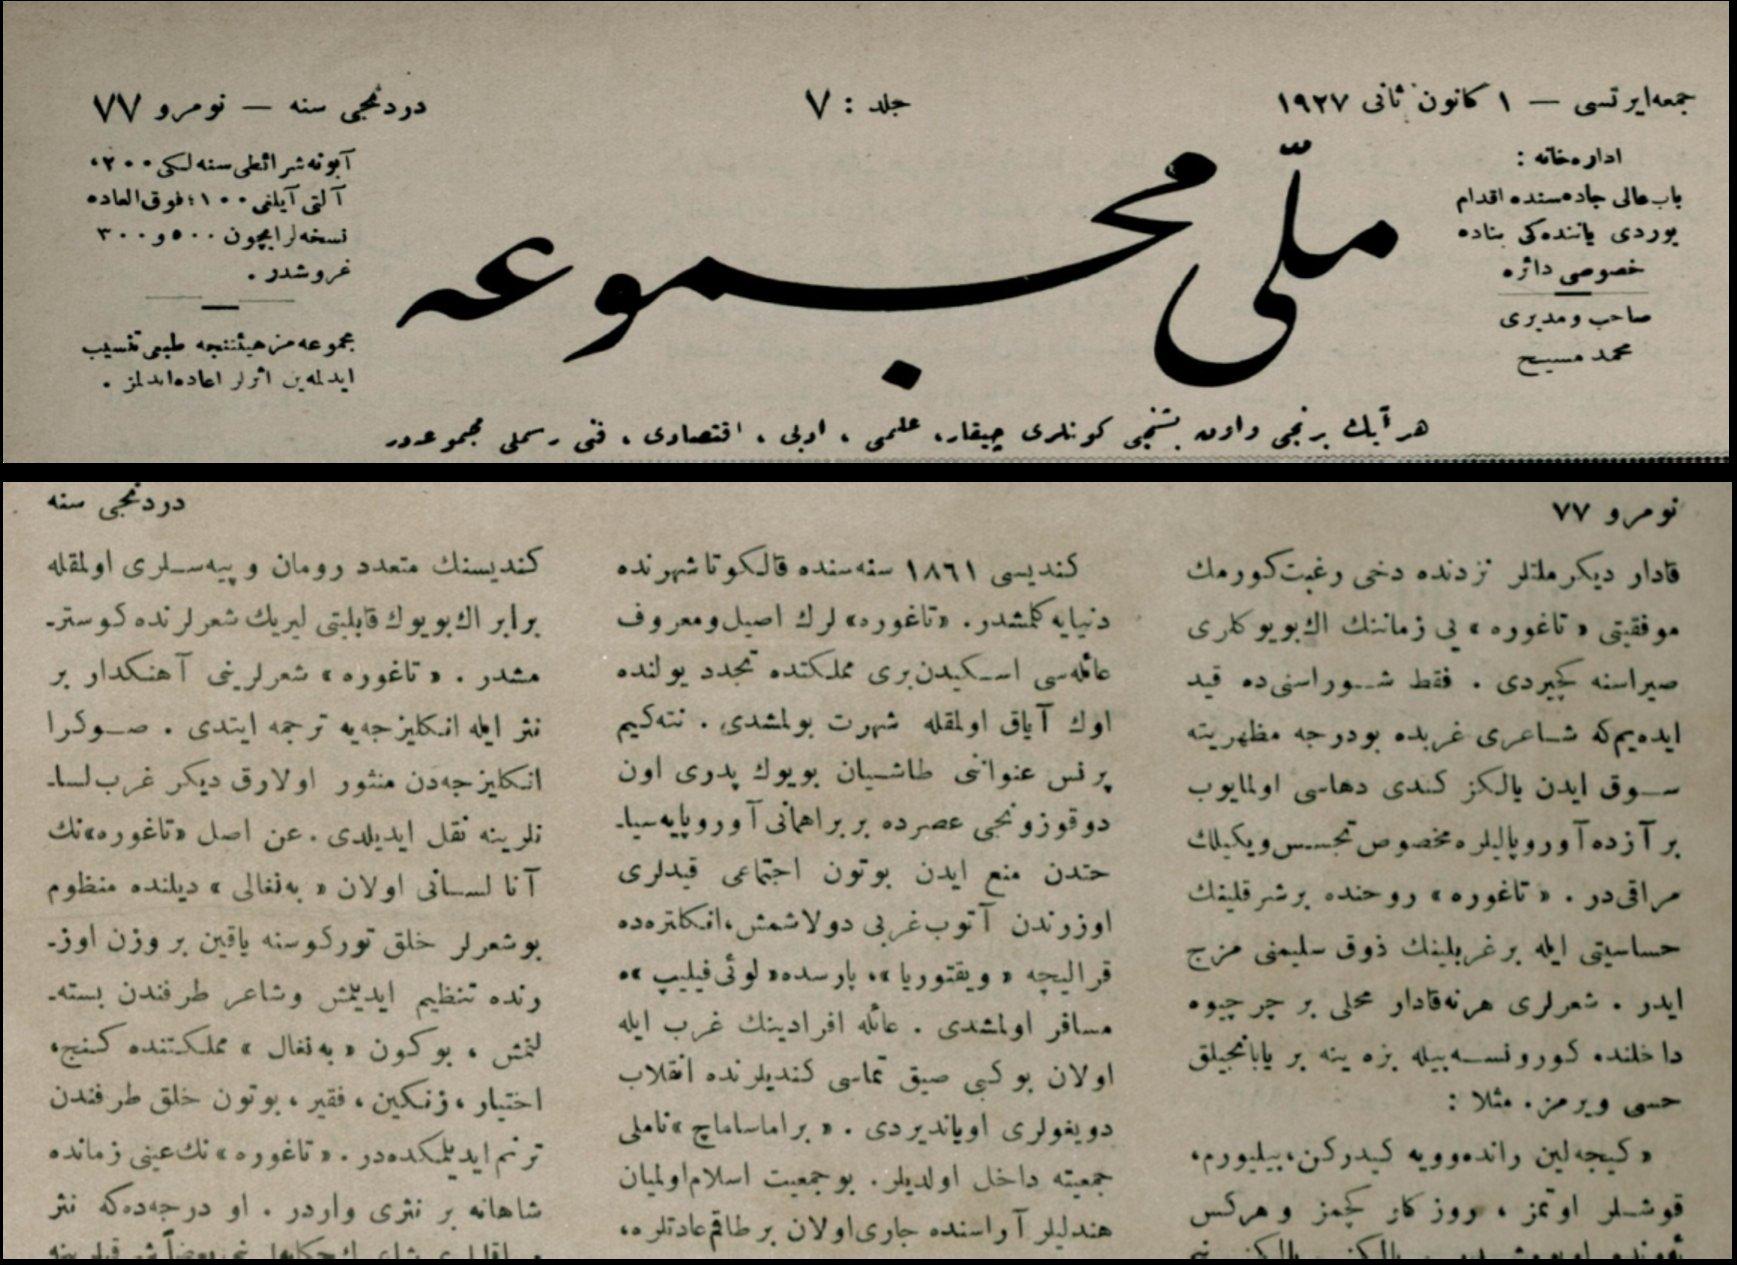 The article of Dr. Safia Sami in Milli Mecmuasi, Jan. 1, 1927.